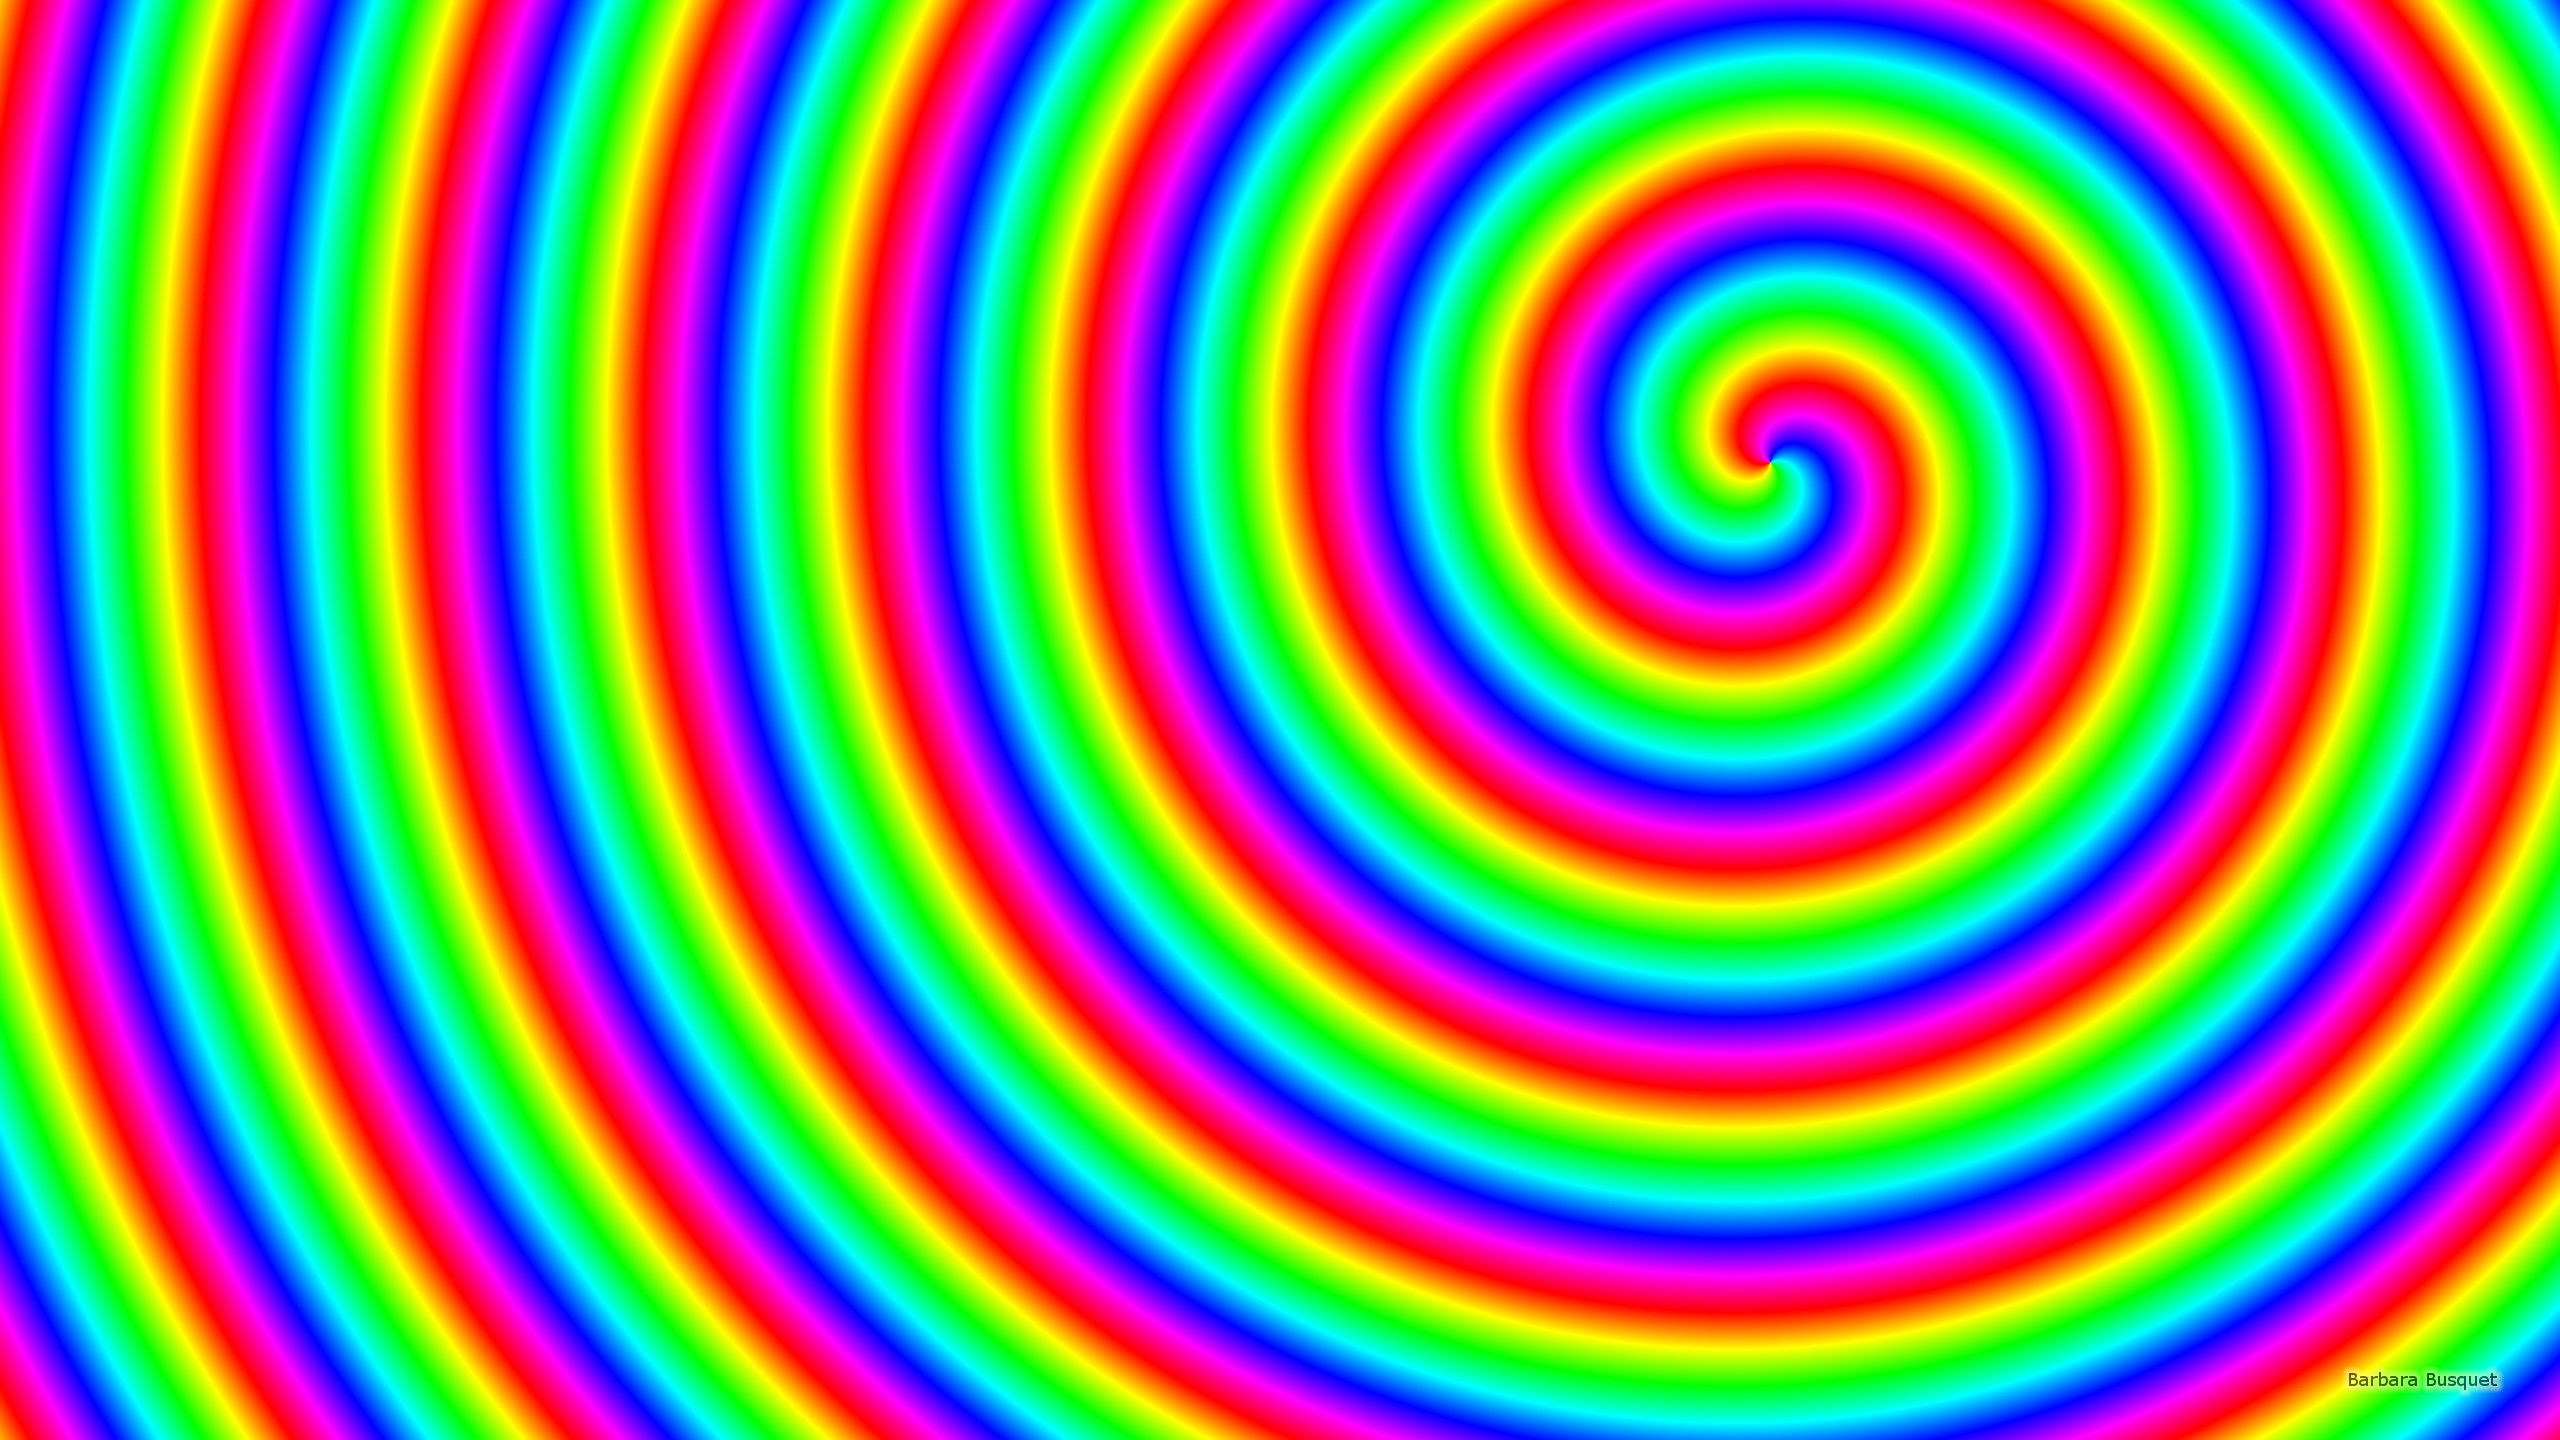 spiral rainbow - photo #15